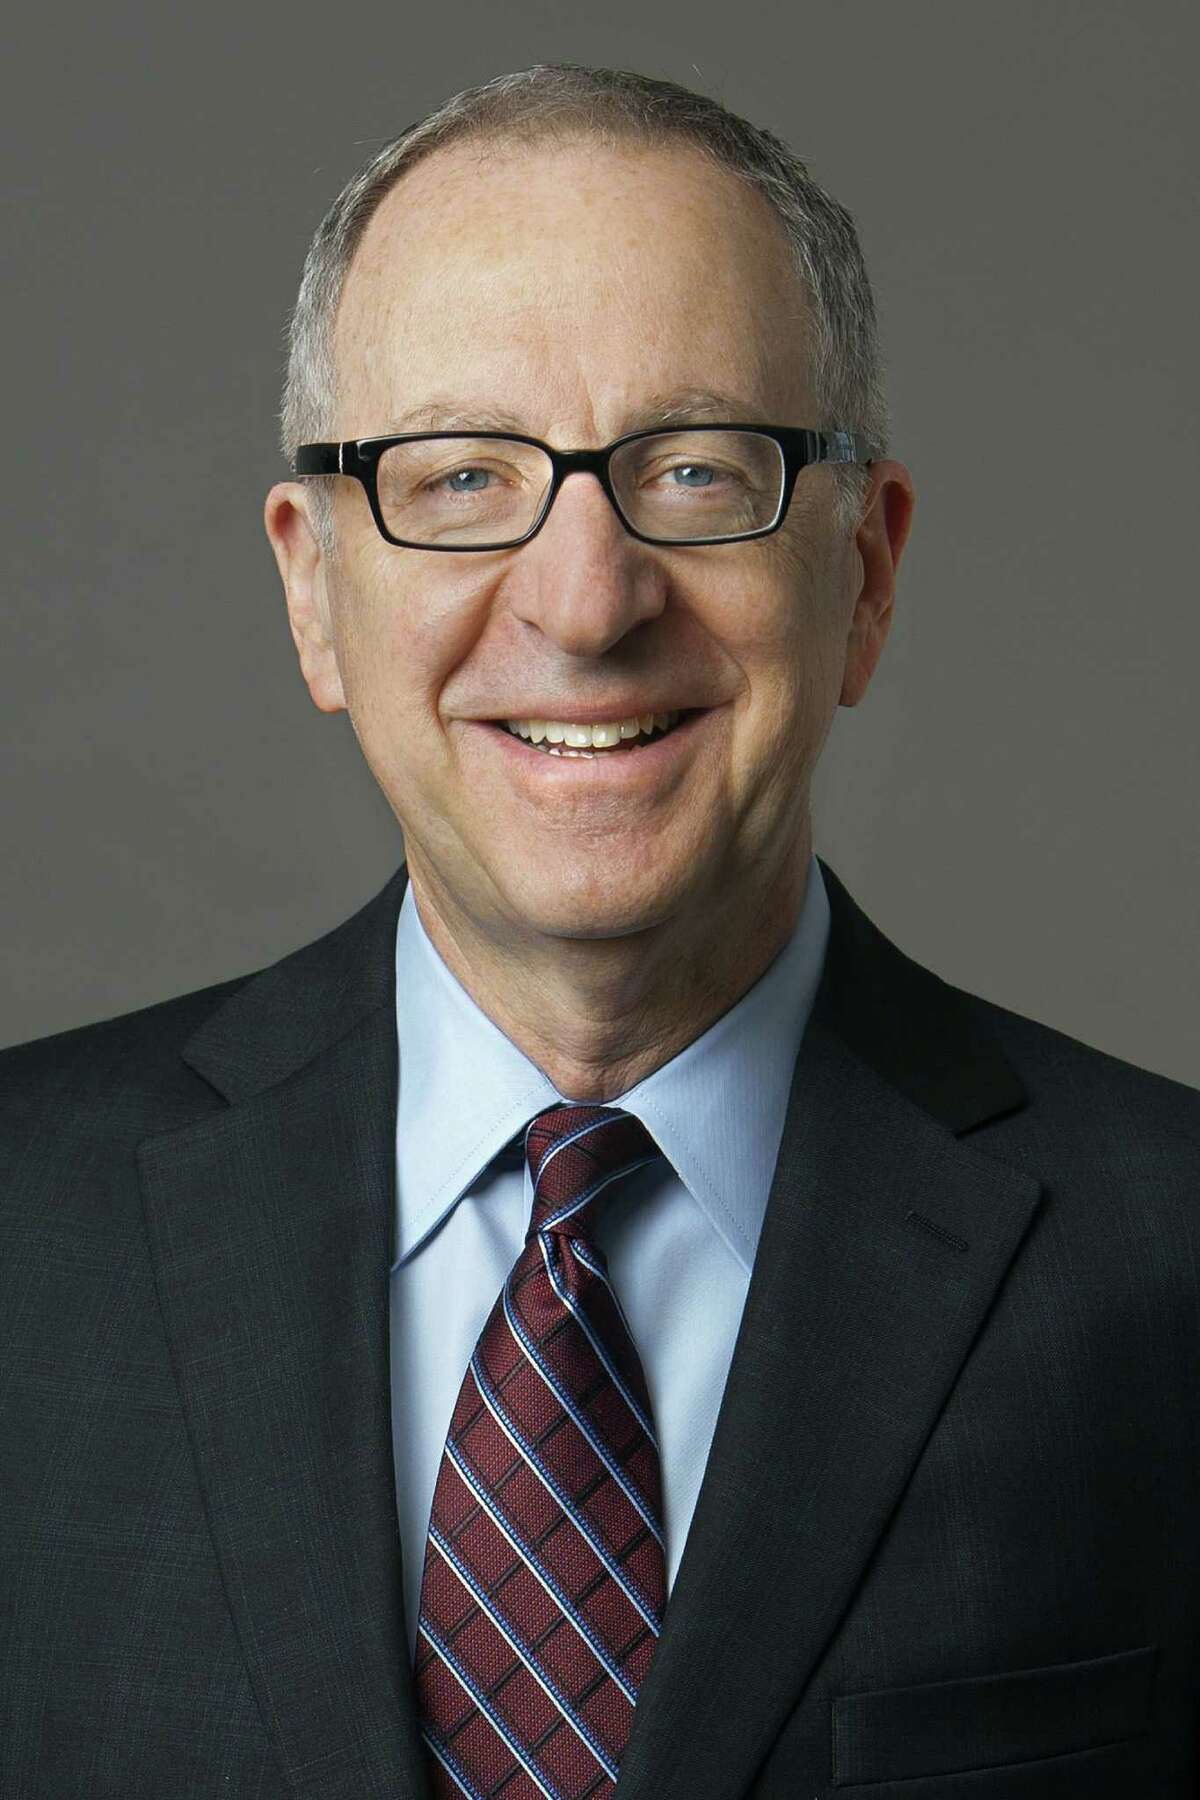 Cornell University President David Skorton. (Cornell University)